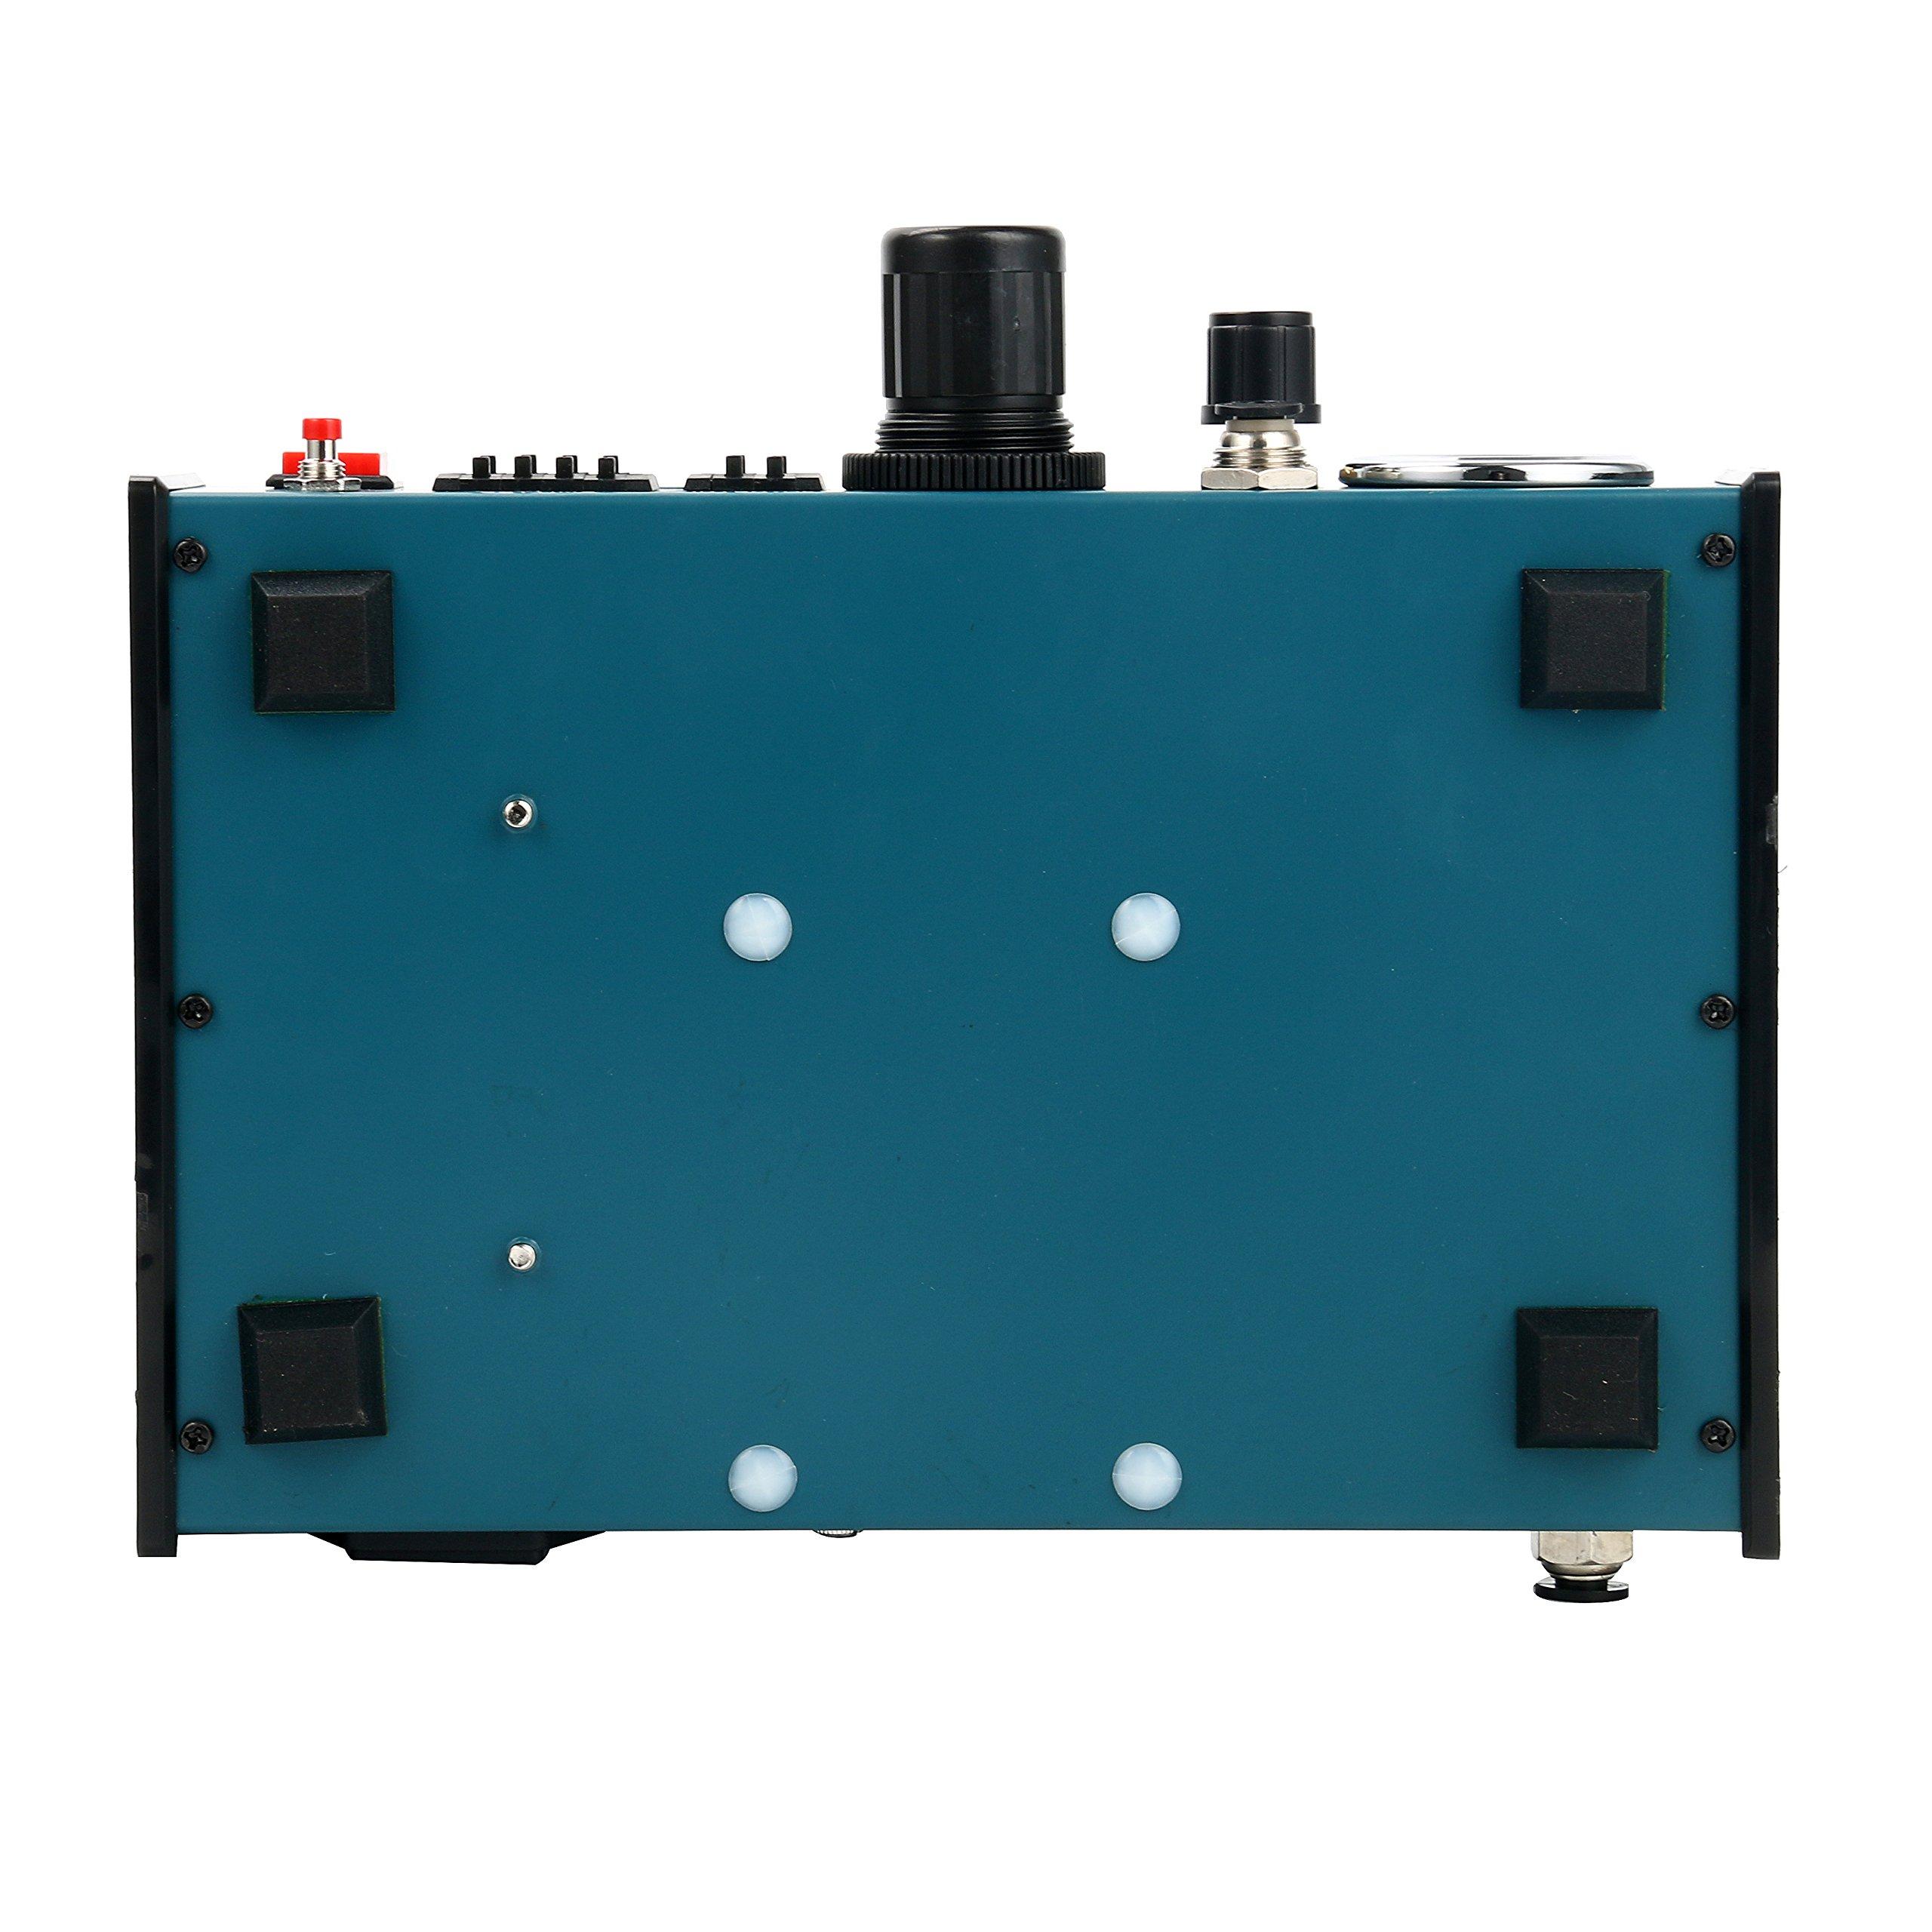 Digital Display Auto Glue Dispenser Solder Paste Liquid Controller Dropper 983A by YaeCCC (Image #9)